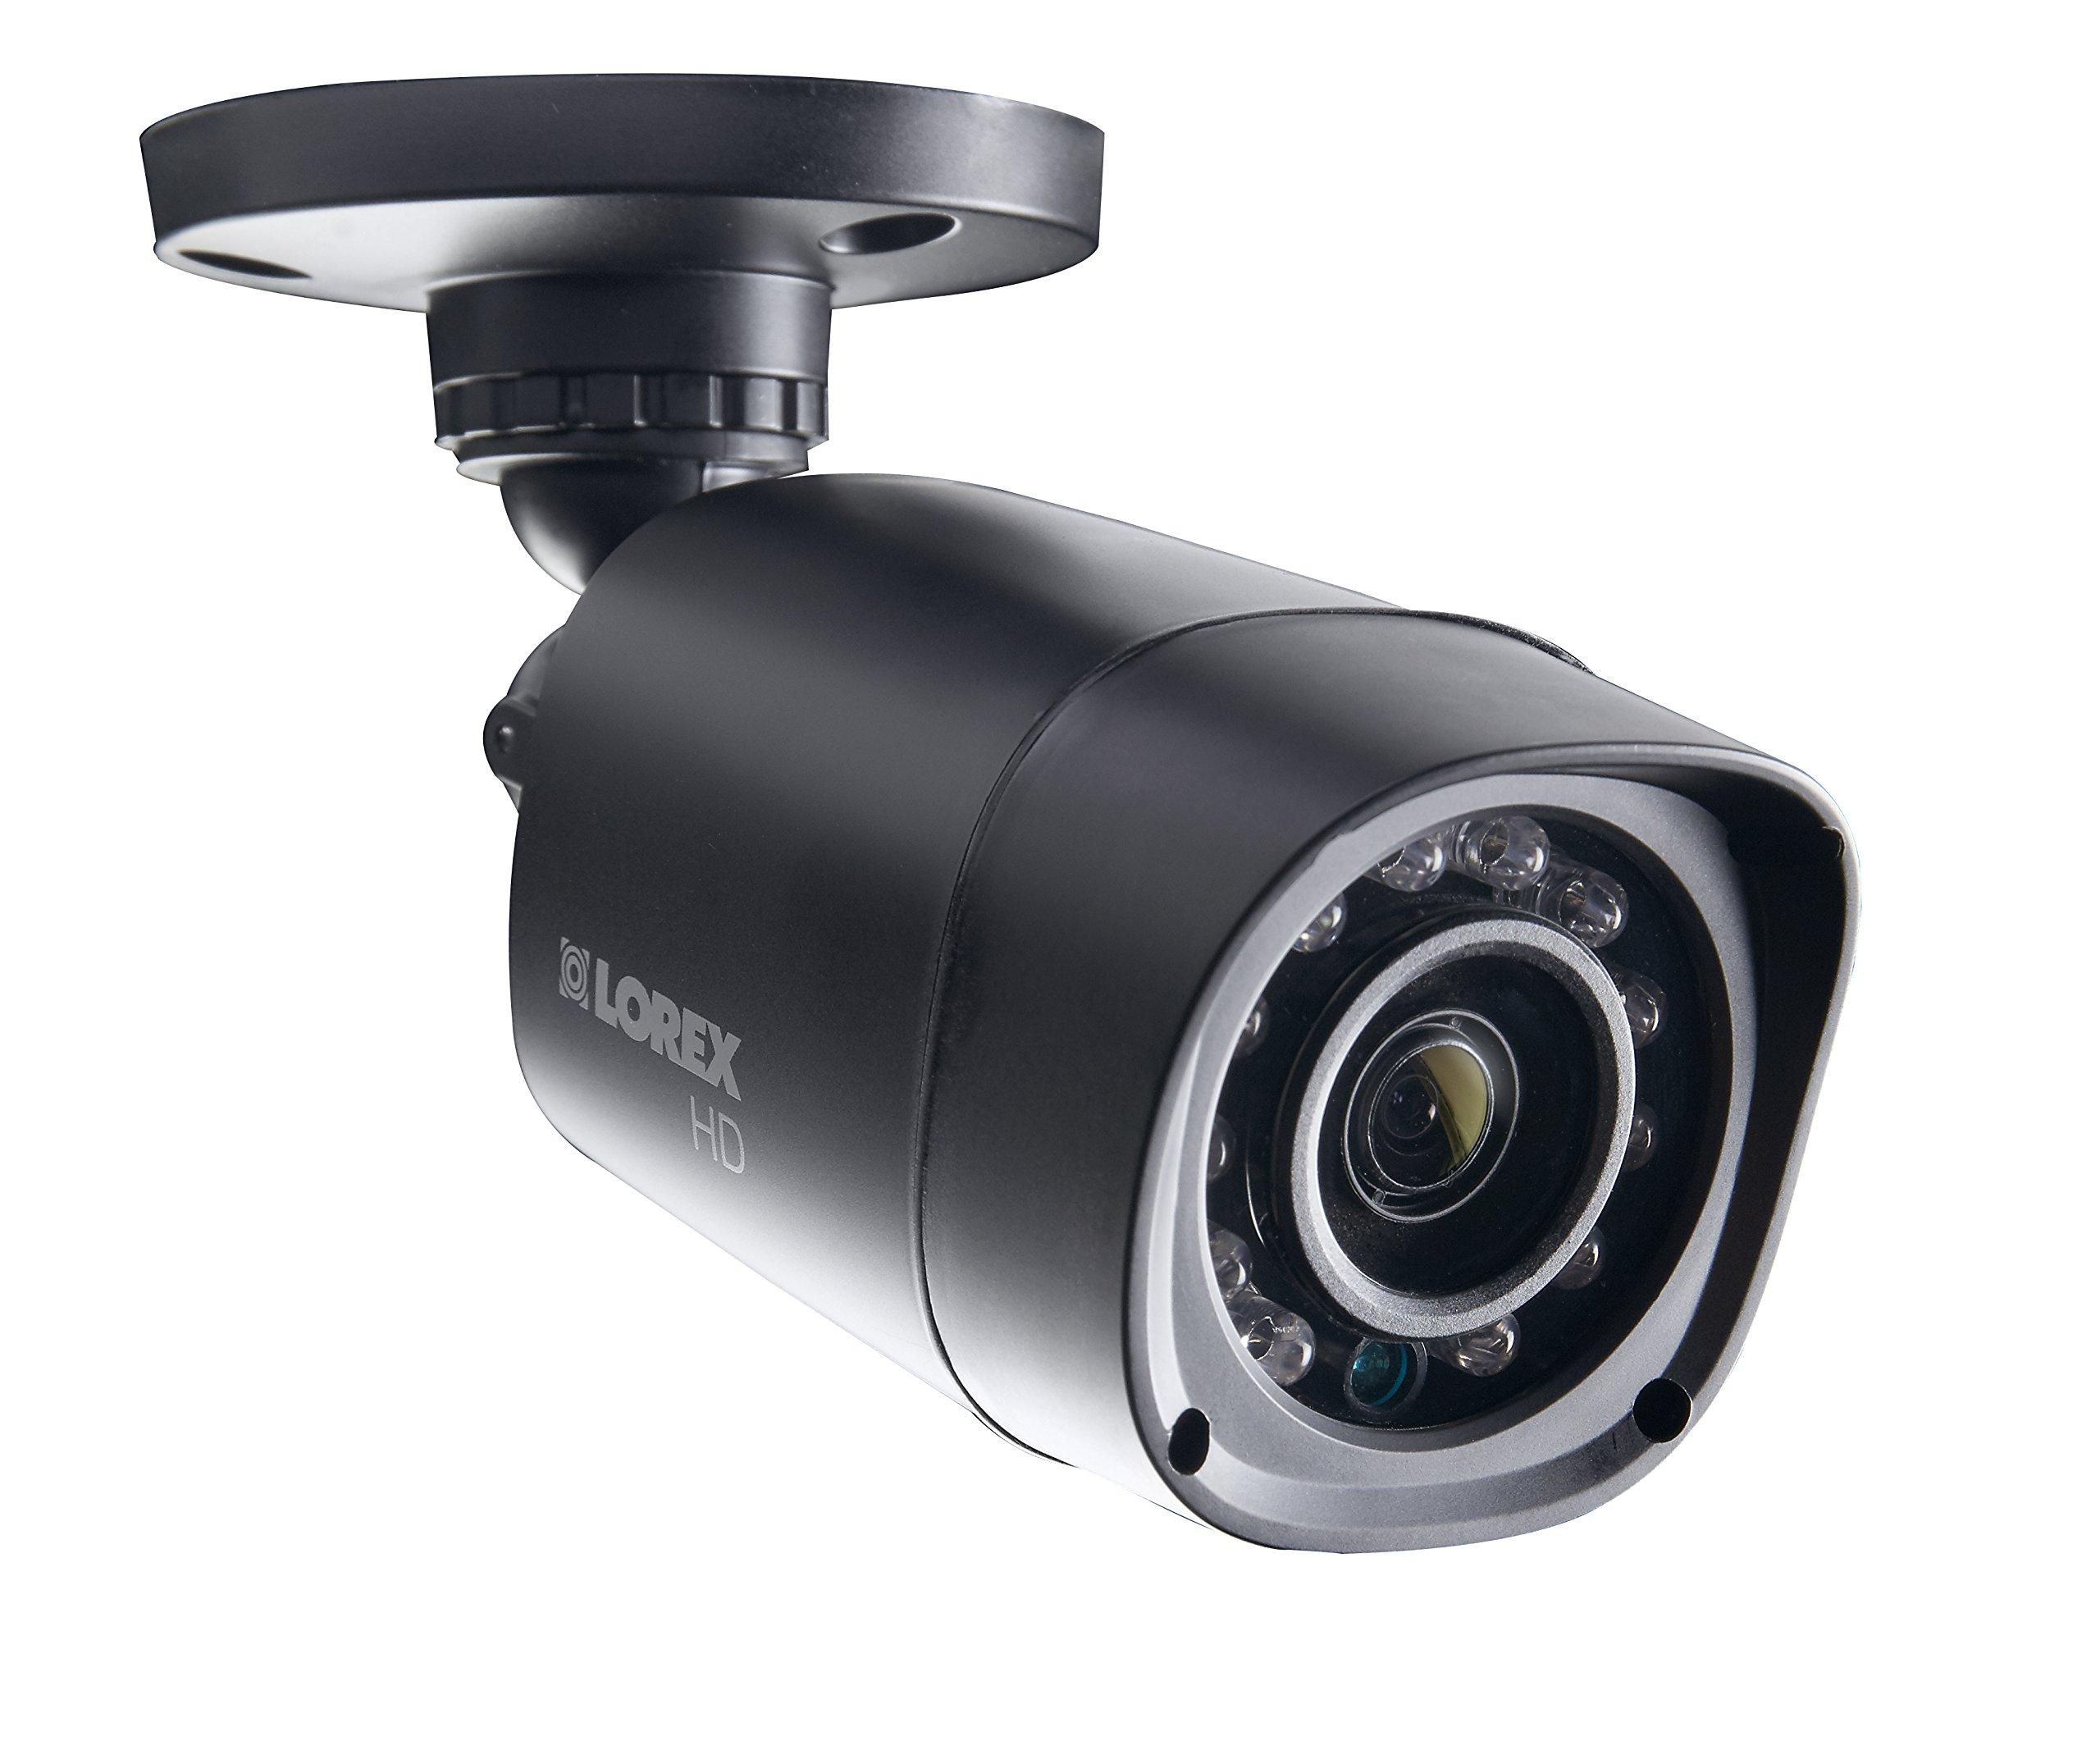 Lorex LBV1511 High Definition 720p 1MP Security Camera (Black)